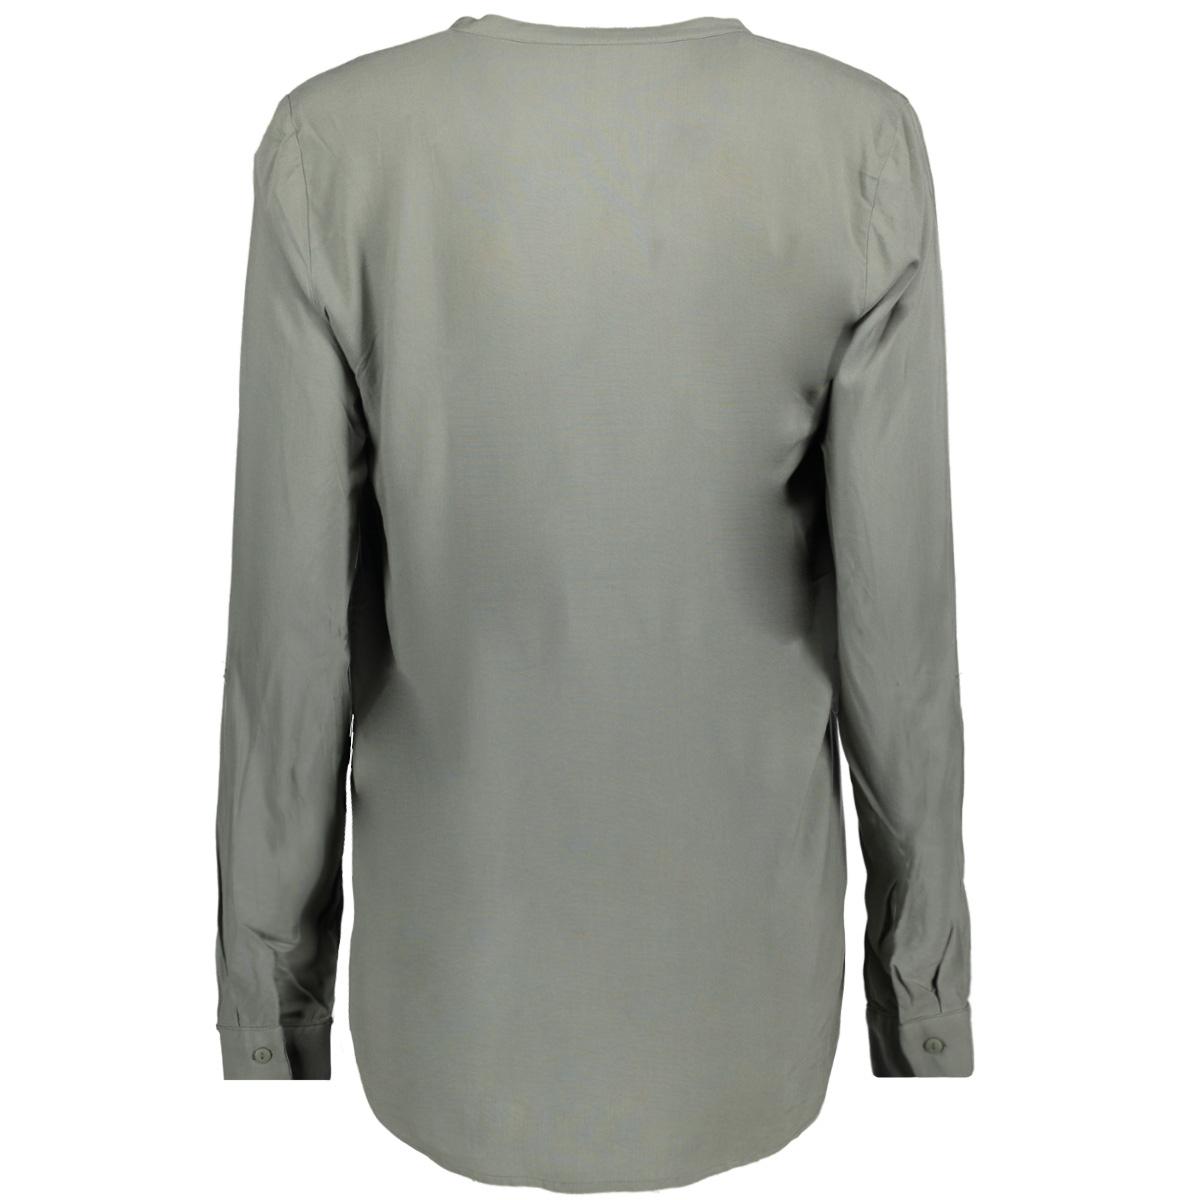 onlfirst ls pocket shirt noos wvn 15133028 only blouse agve green